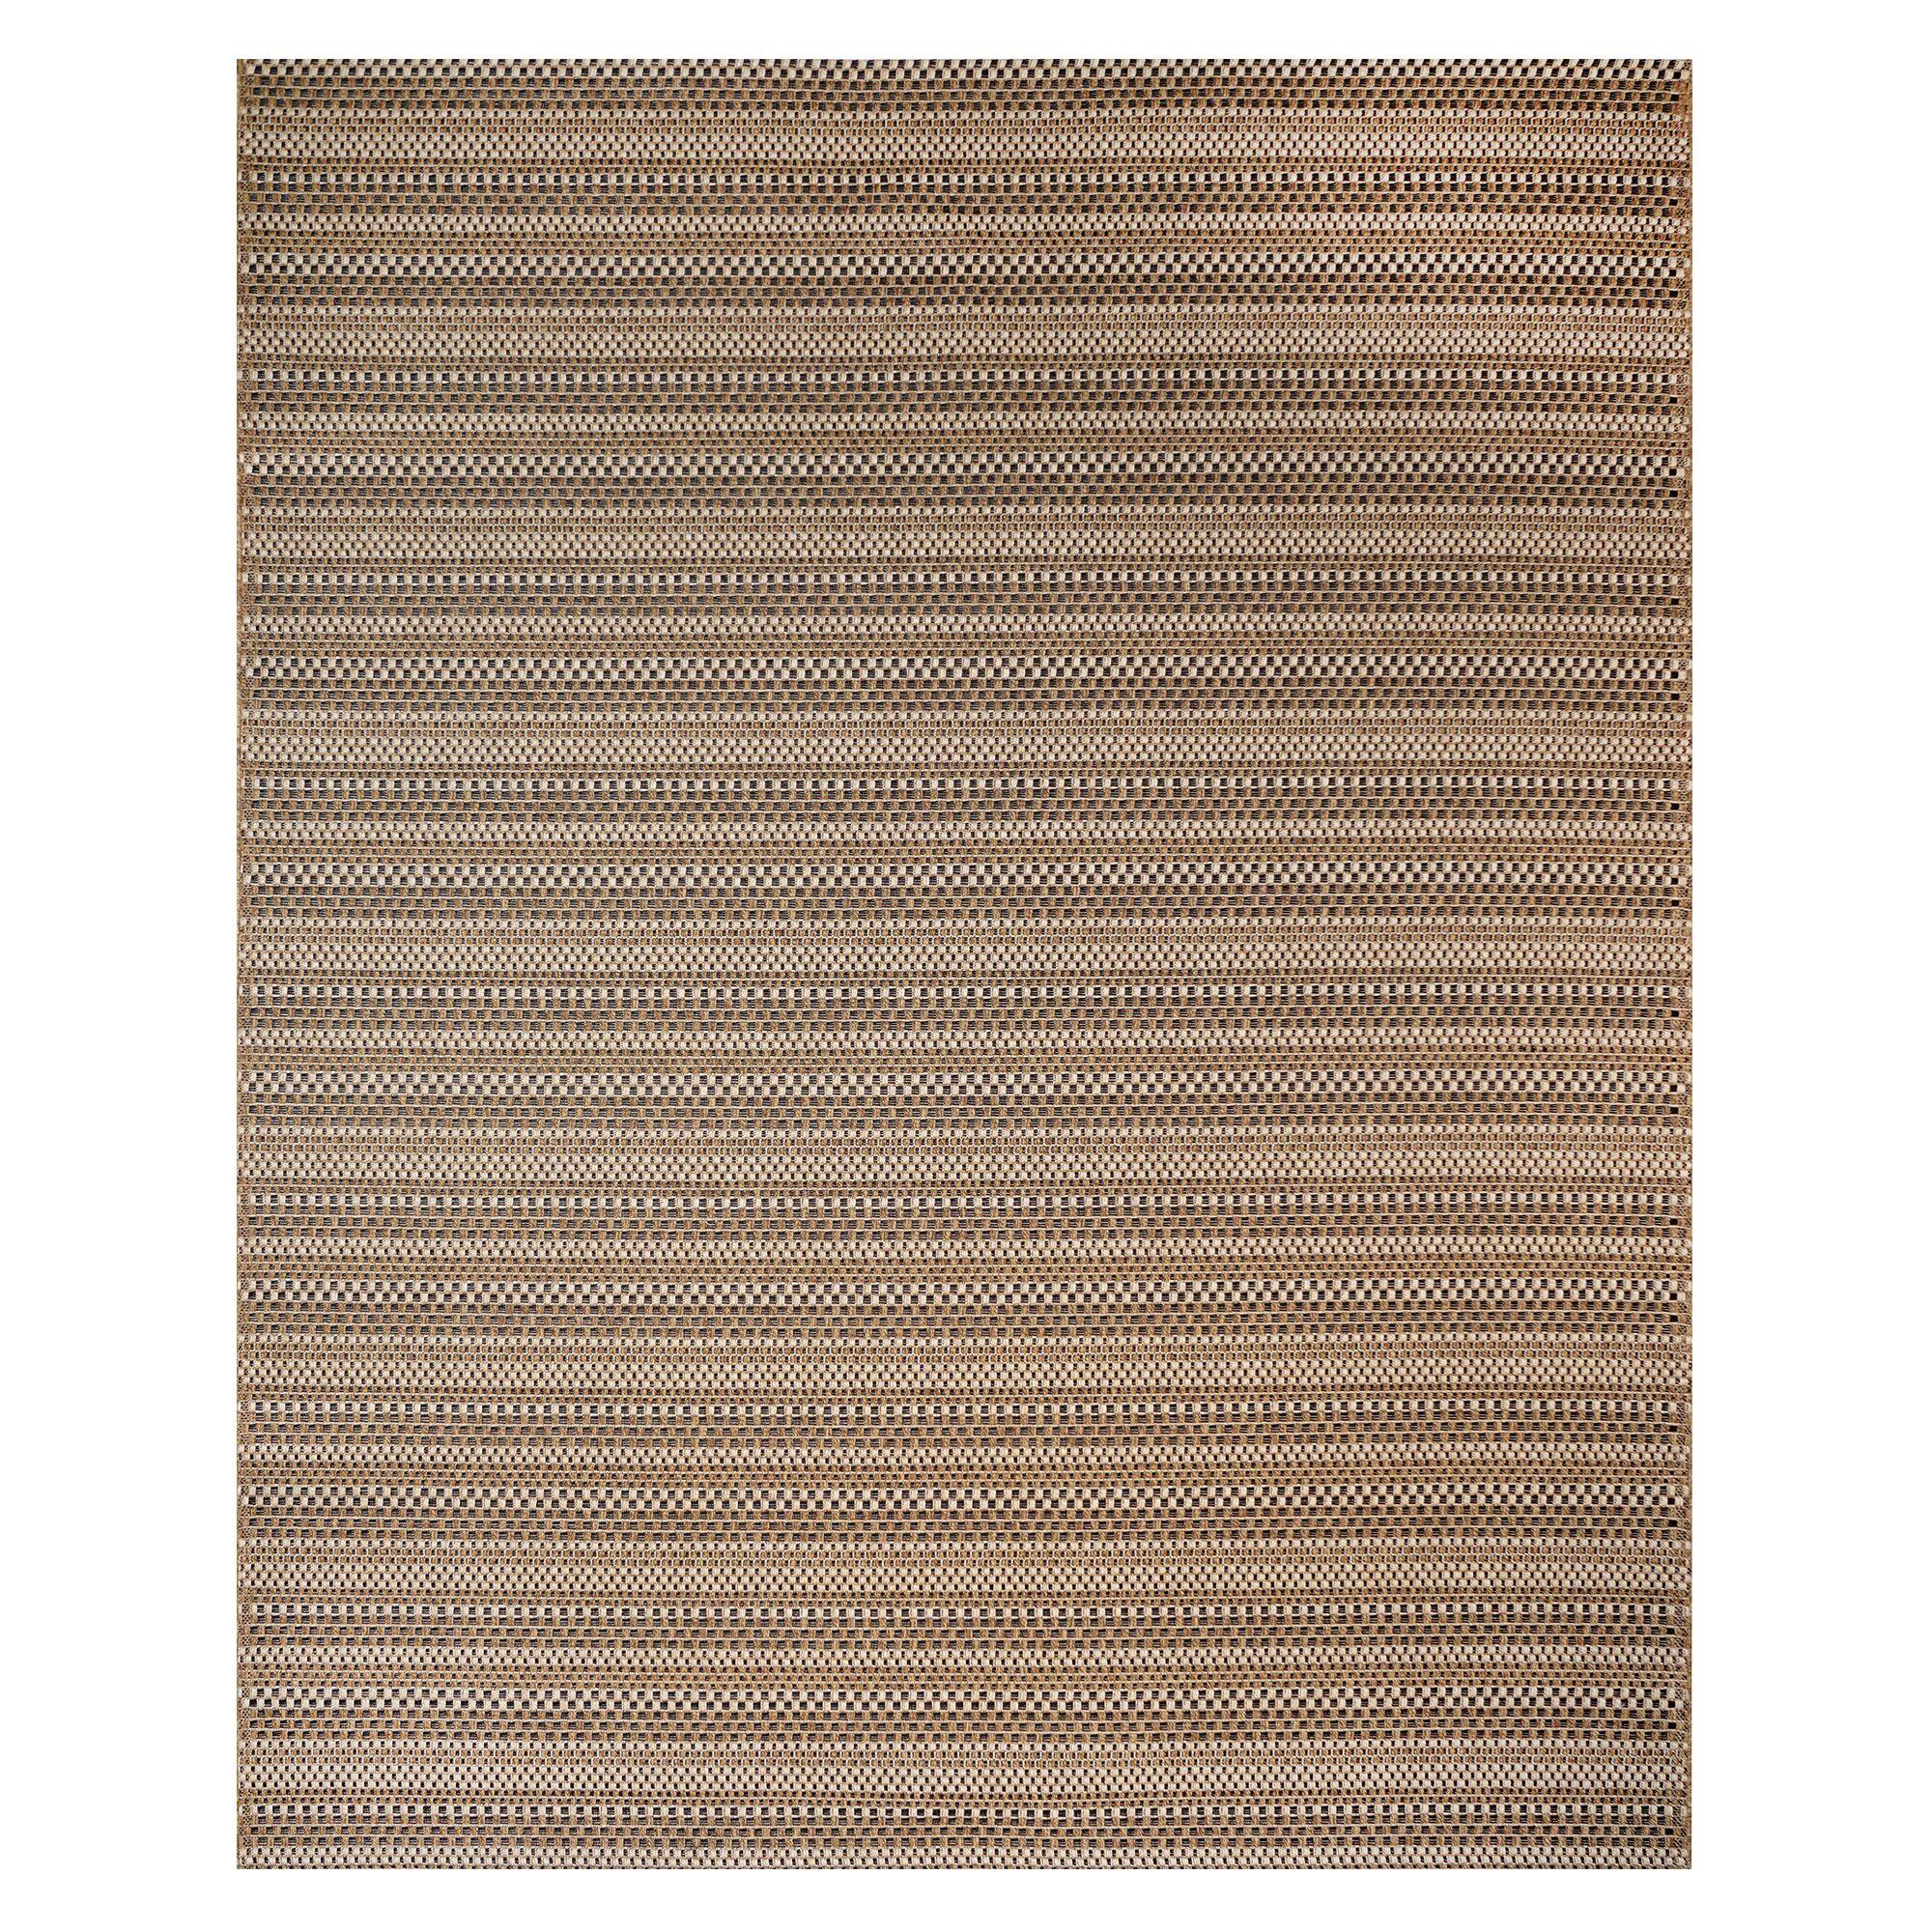 Jennings Chestnut Black Indoor/Outdoor Area Rug Rug Size: Rectangle 5'3